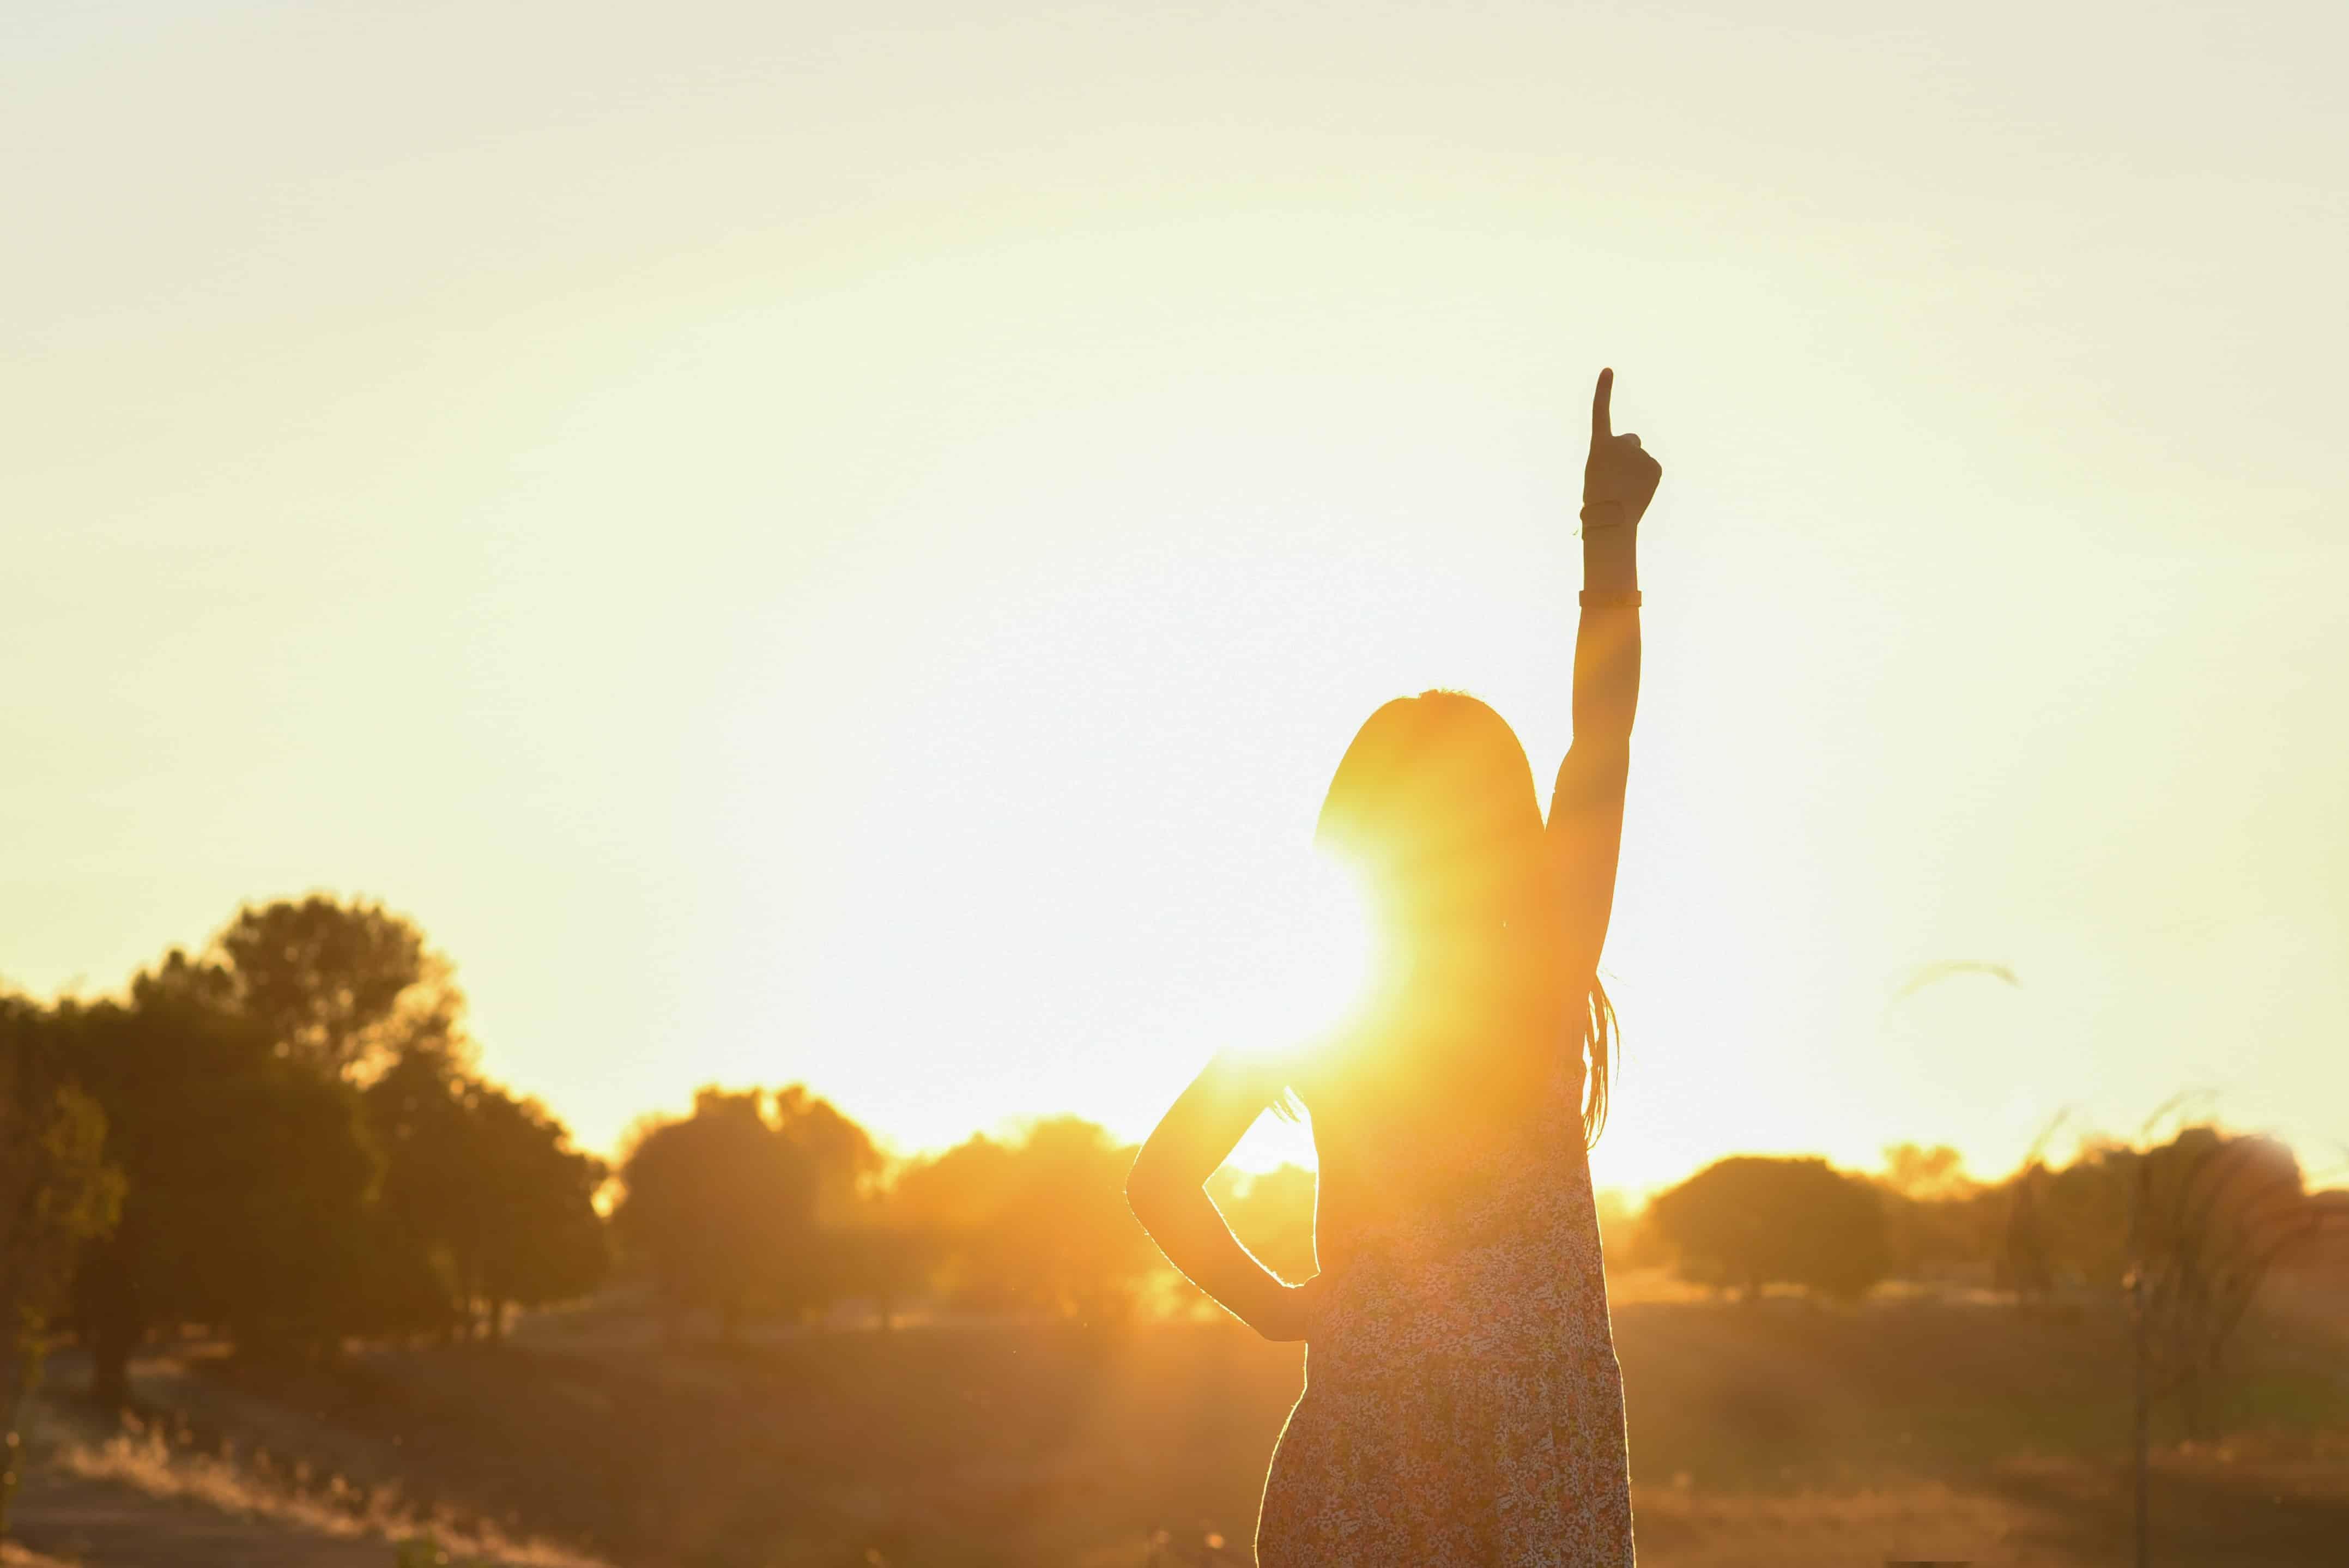 Frau zeigt auf in Sonnenaufgang